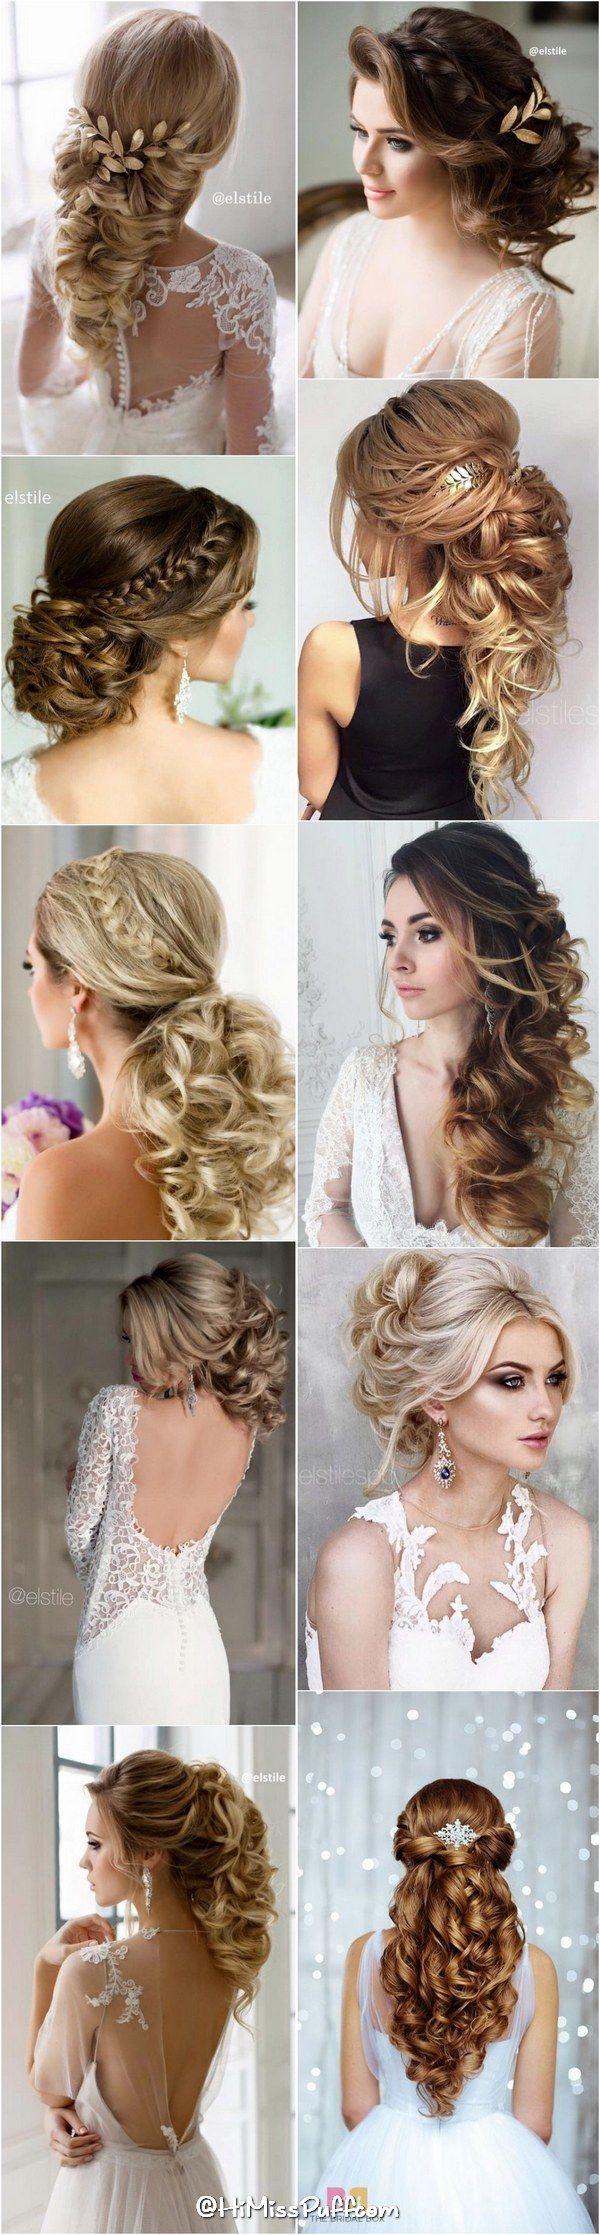 best 25+ engagement hairstyles ideas on pinterest | wedding